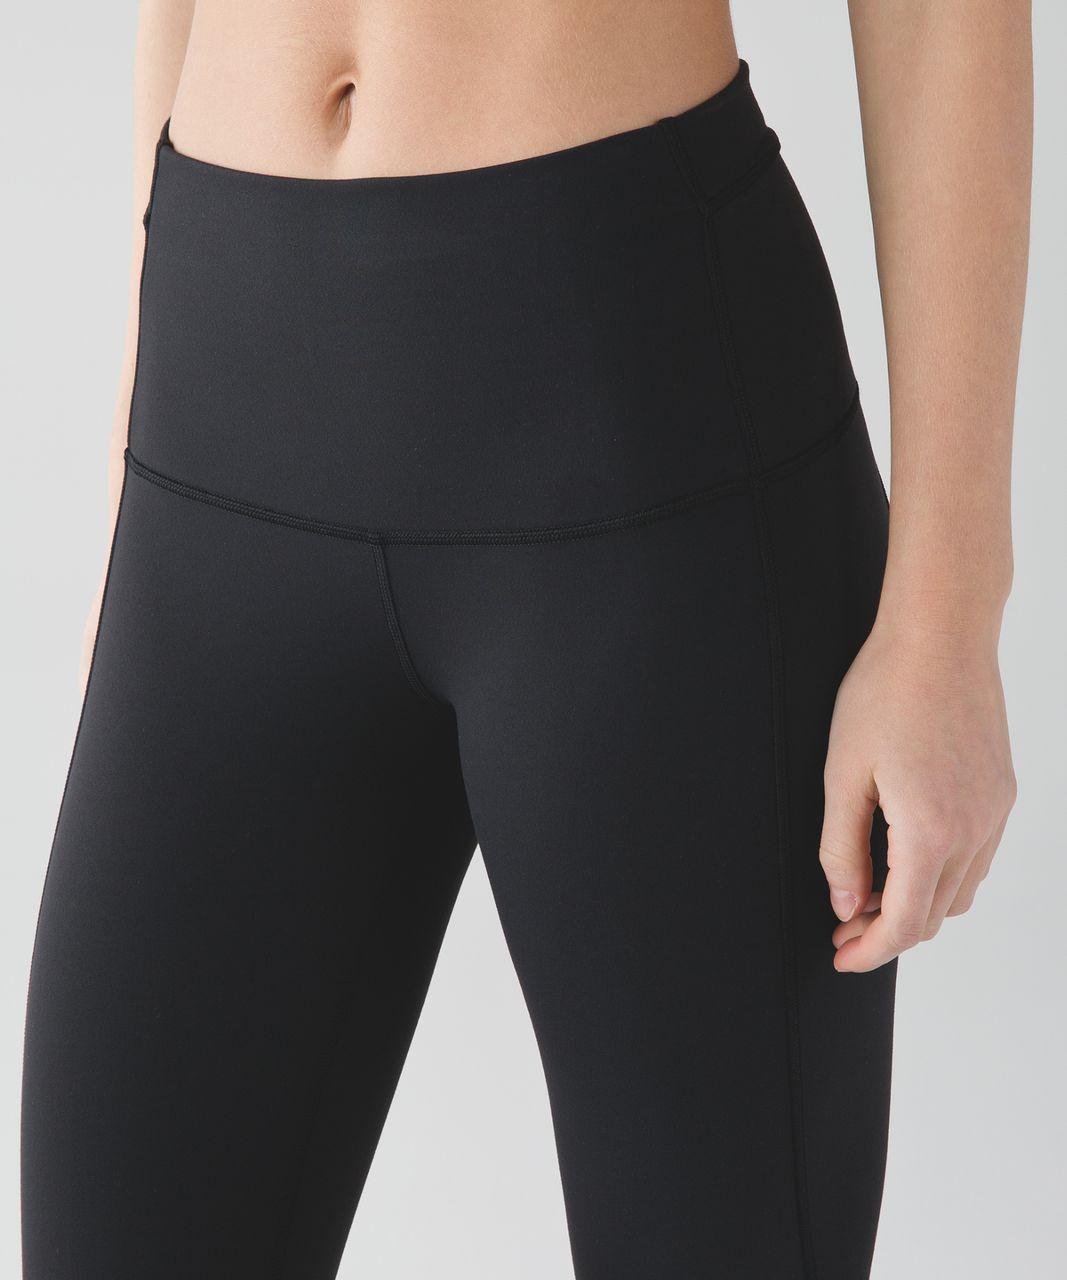 Lululemon Pure Practice Pant - Black